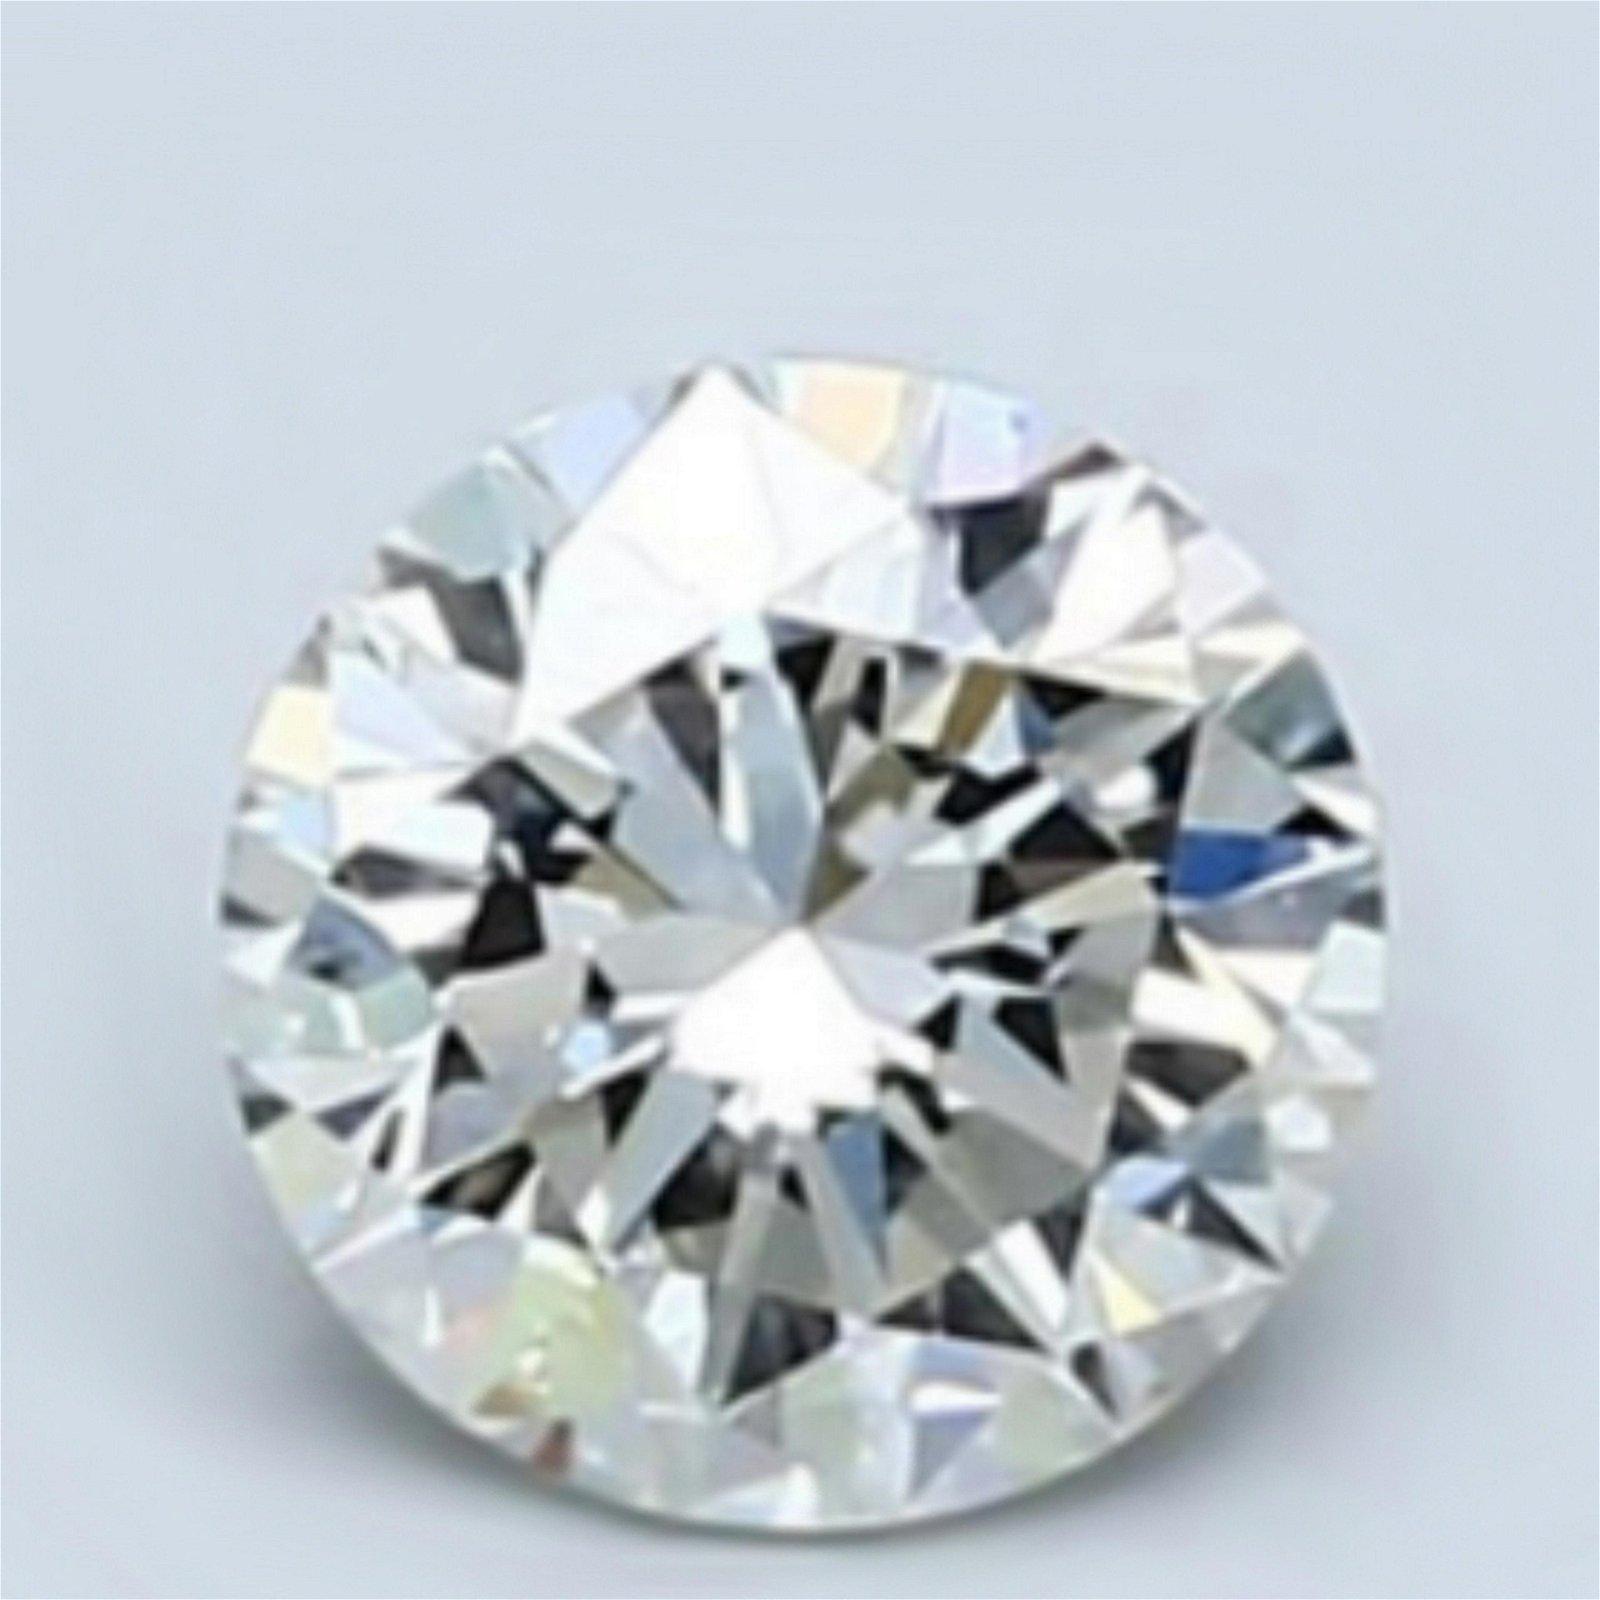 1.04 ct Loose Round Cut Diamond Color J VVS1 32% OFF